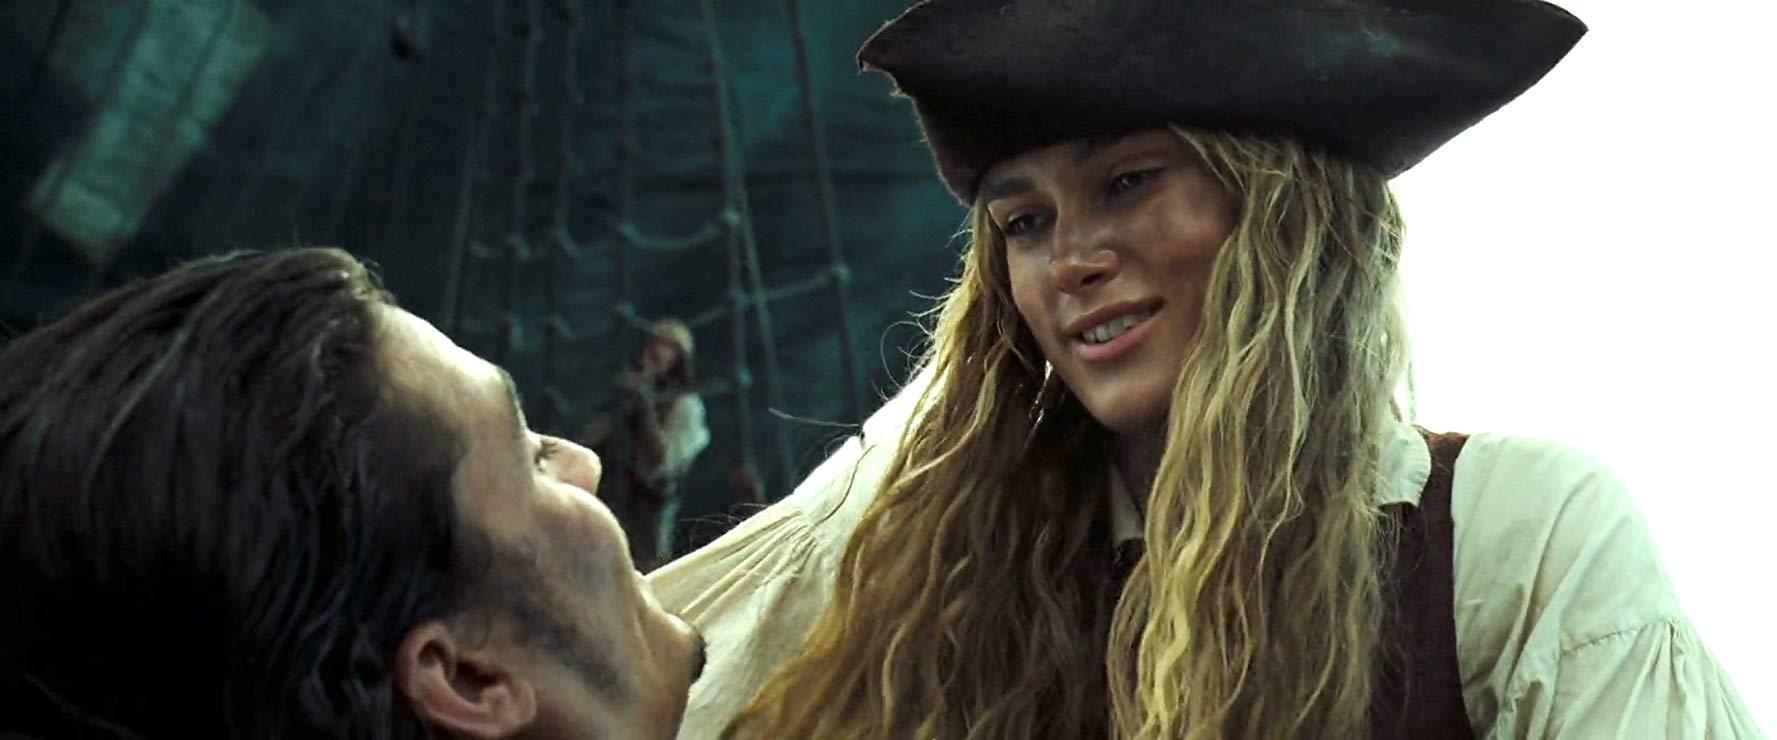 15ee22024 ... فيلم Pirates Of The Caribbean Dead Mans Chest 2006 مترجم